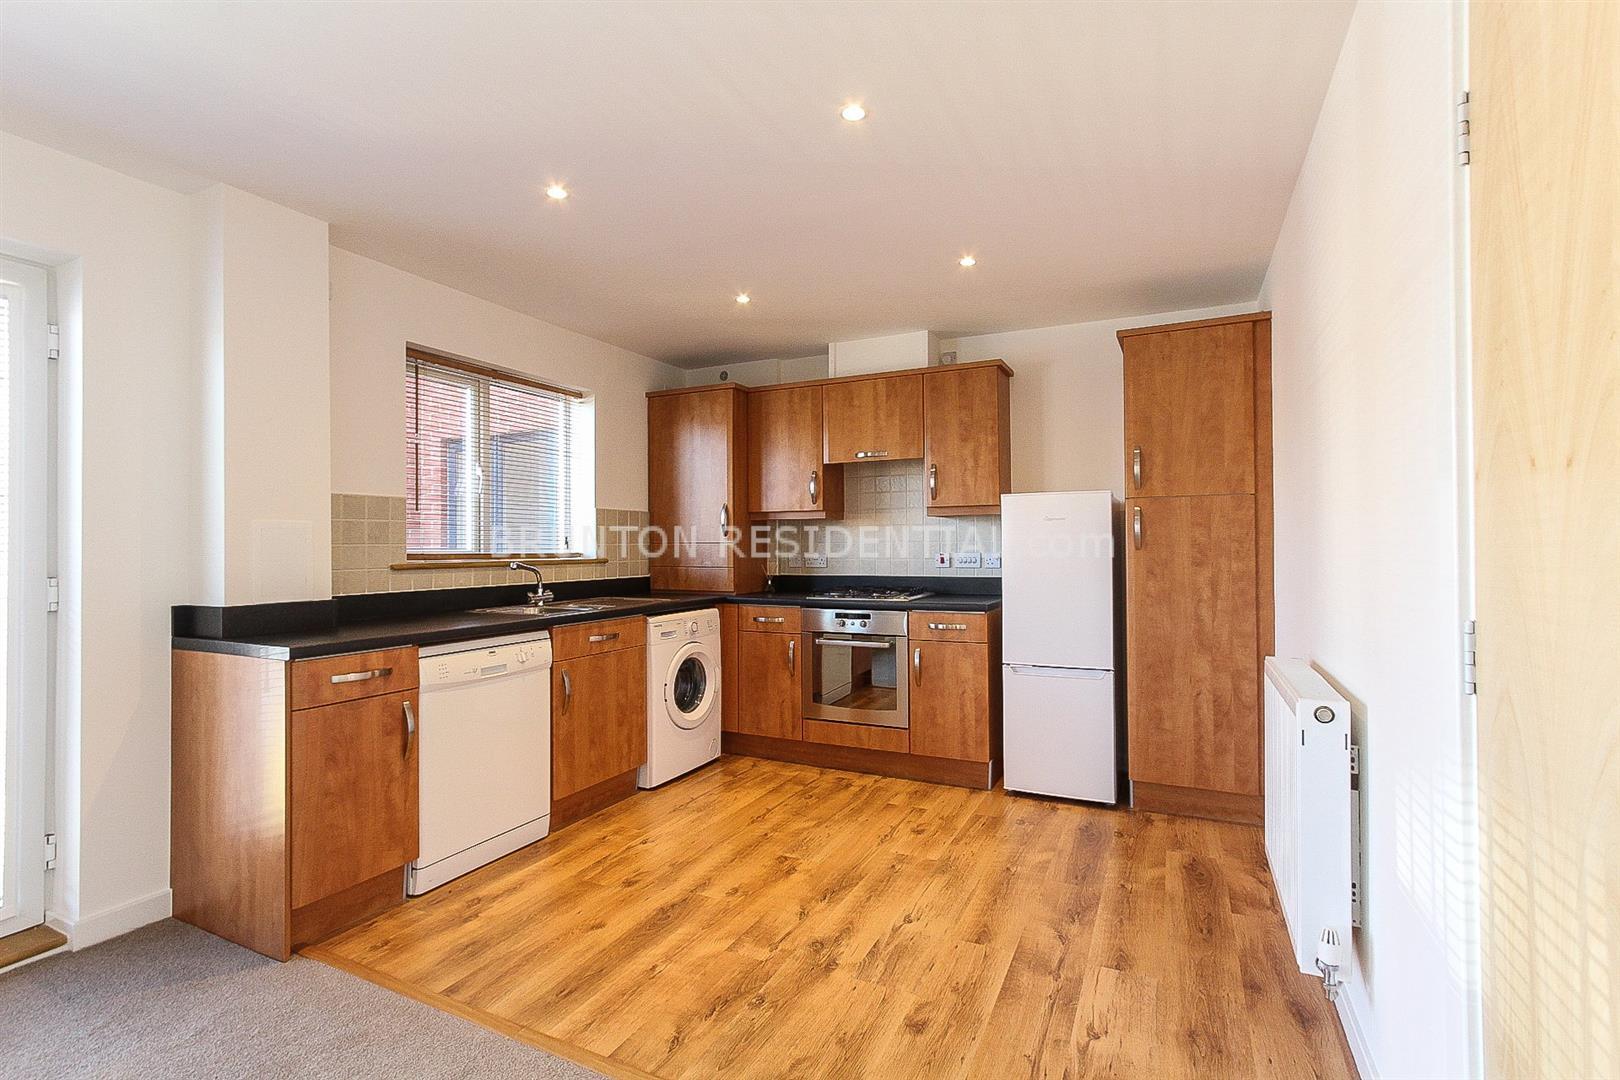 2 bed apartment to rent in St Michaels Vale, Hebburn, NE31